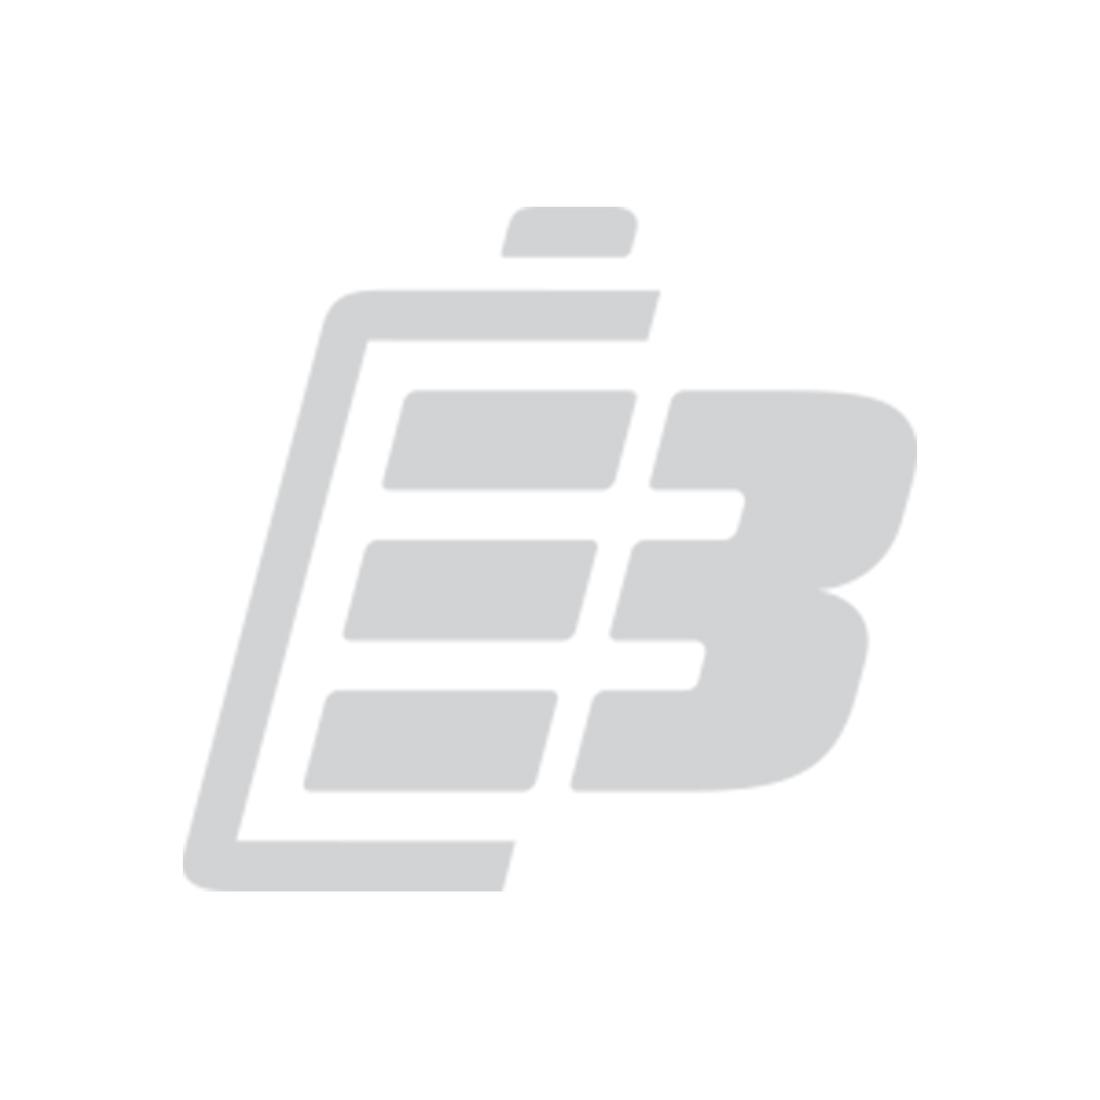 Laptop battery Toshiba Satellite C660_1